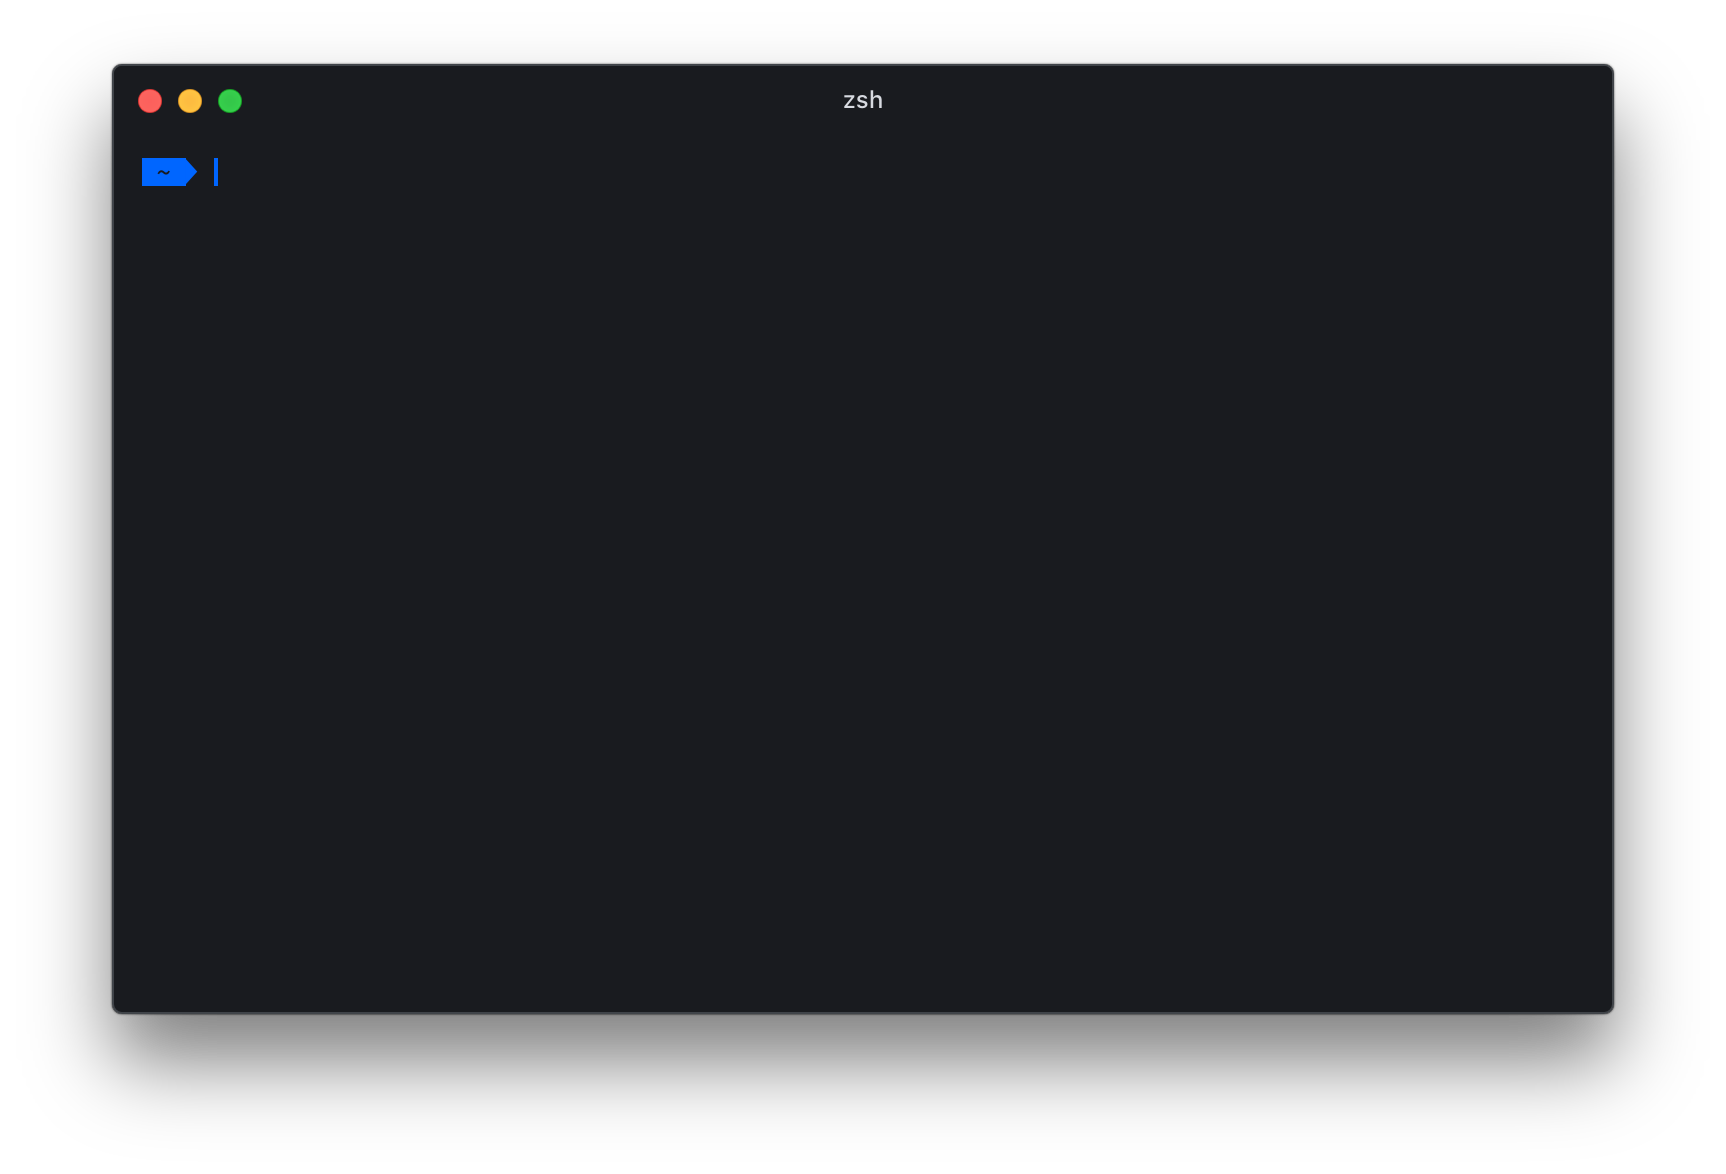 Screenshot at start